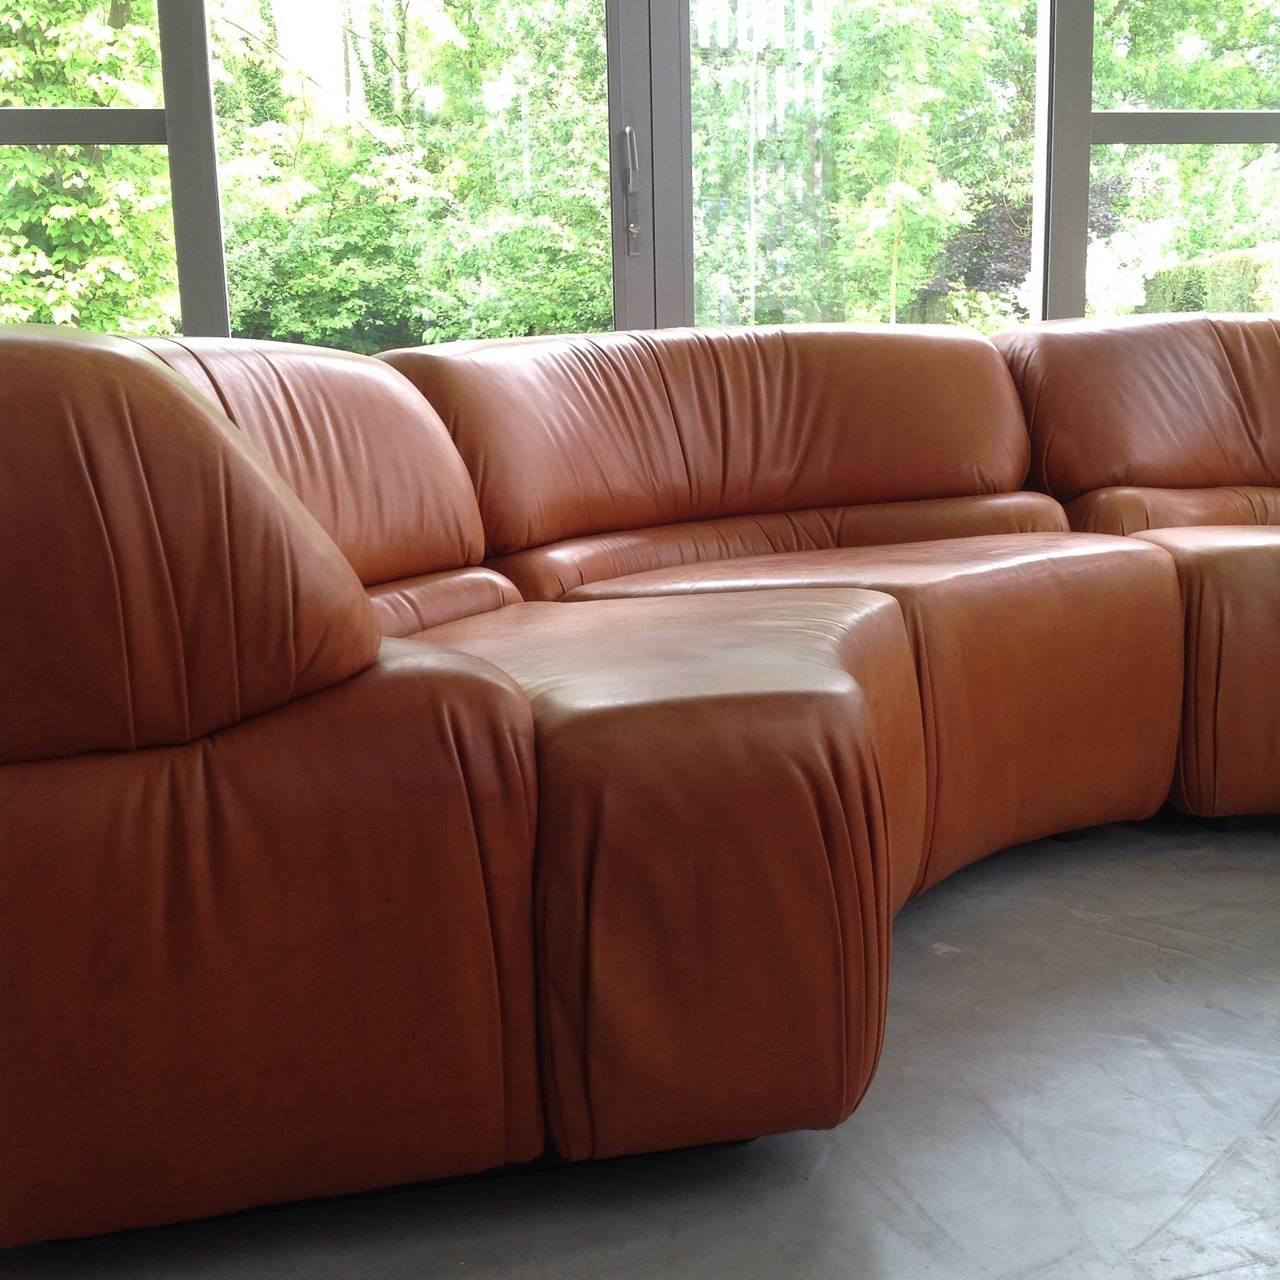 De Sede Cosmos Modular Sofa Original Beautiful Cognac Leather 1970 At 1stdibs